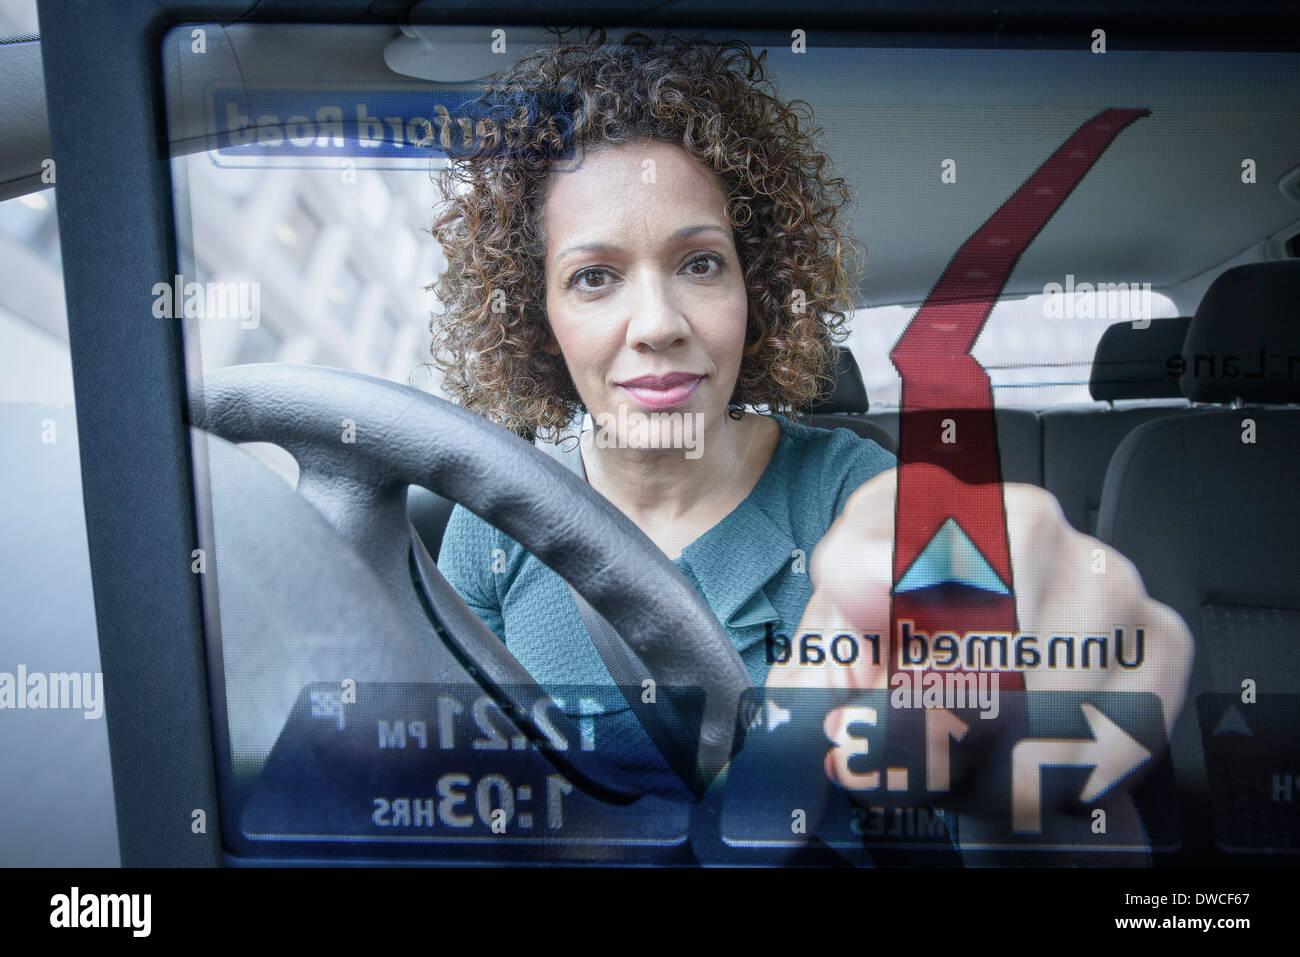 Woman operates car satellite navigation as seen through screen - Stock Image